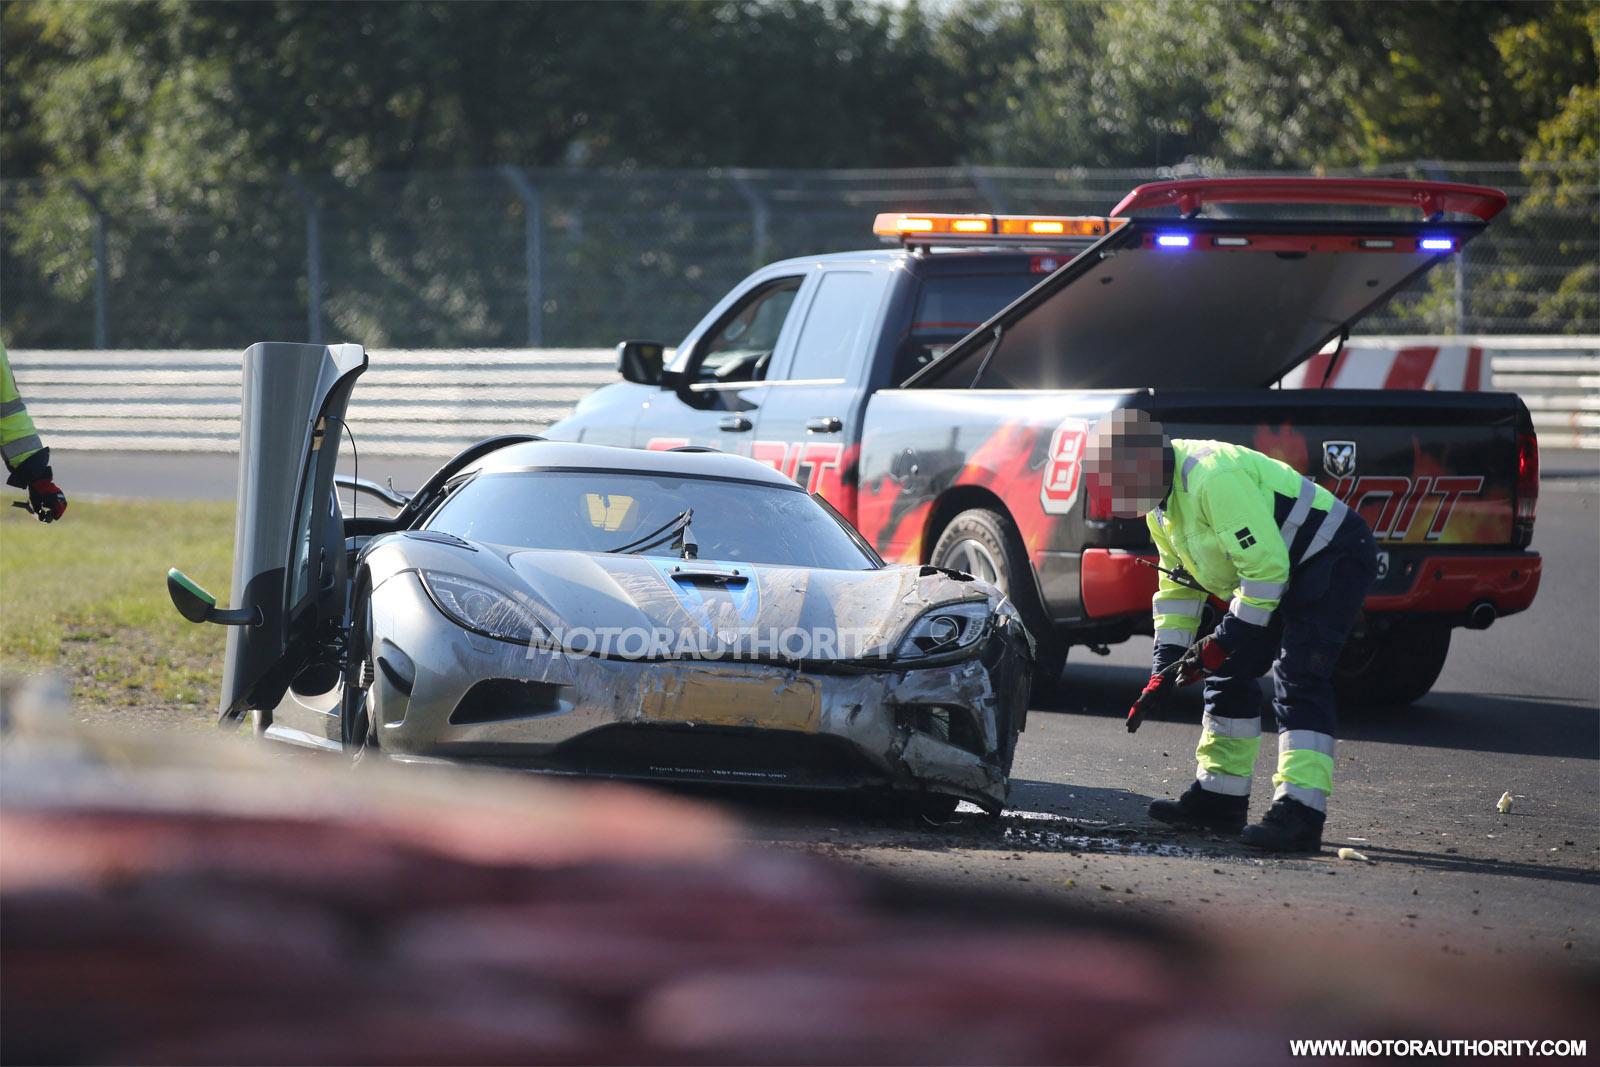 2016 Koenigsegg Agera R Development Prototype Crashed On